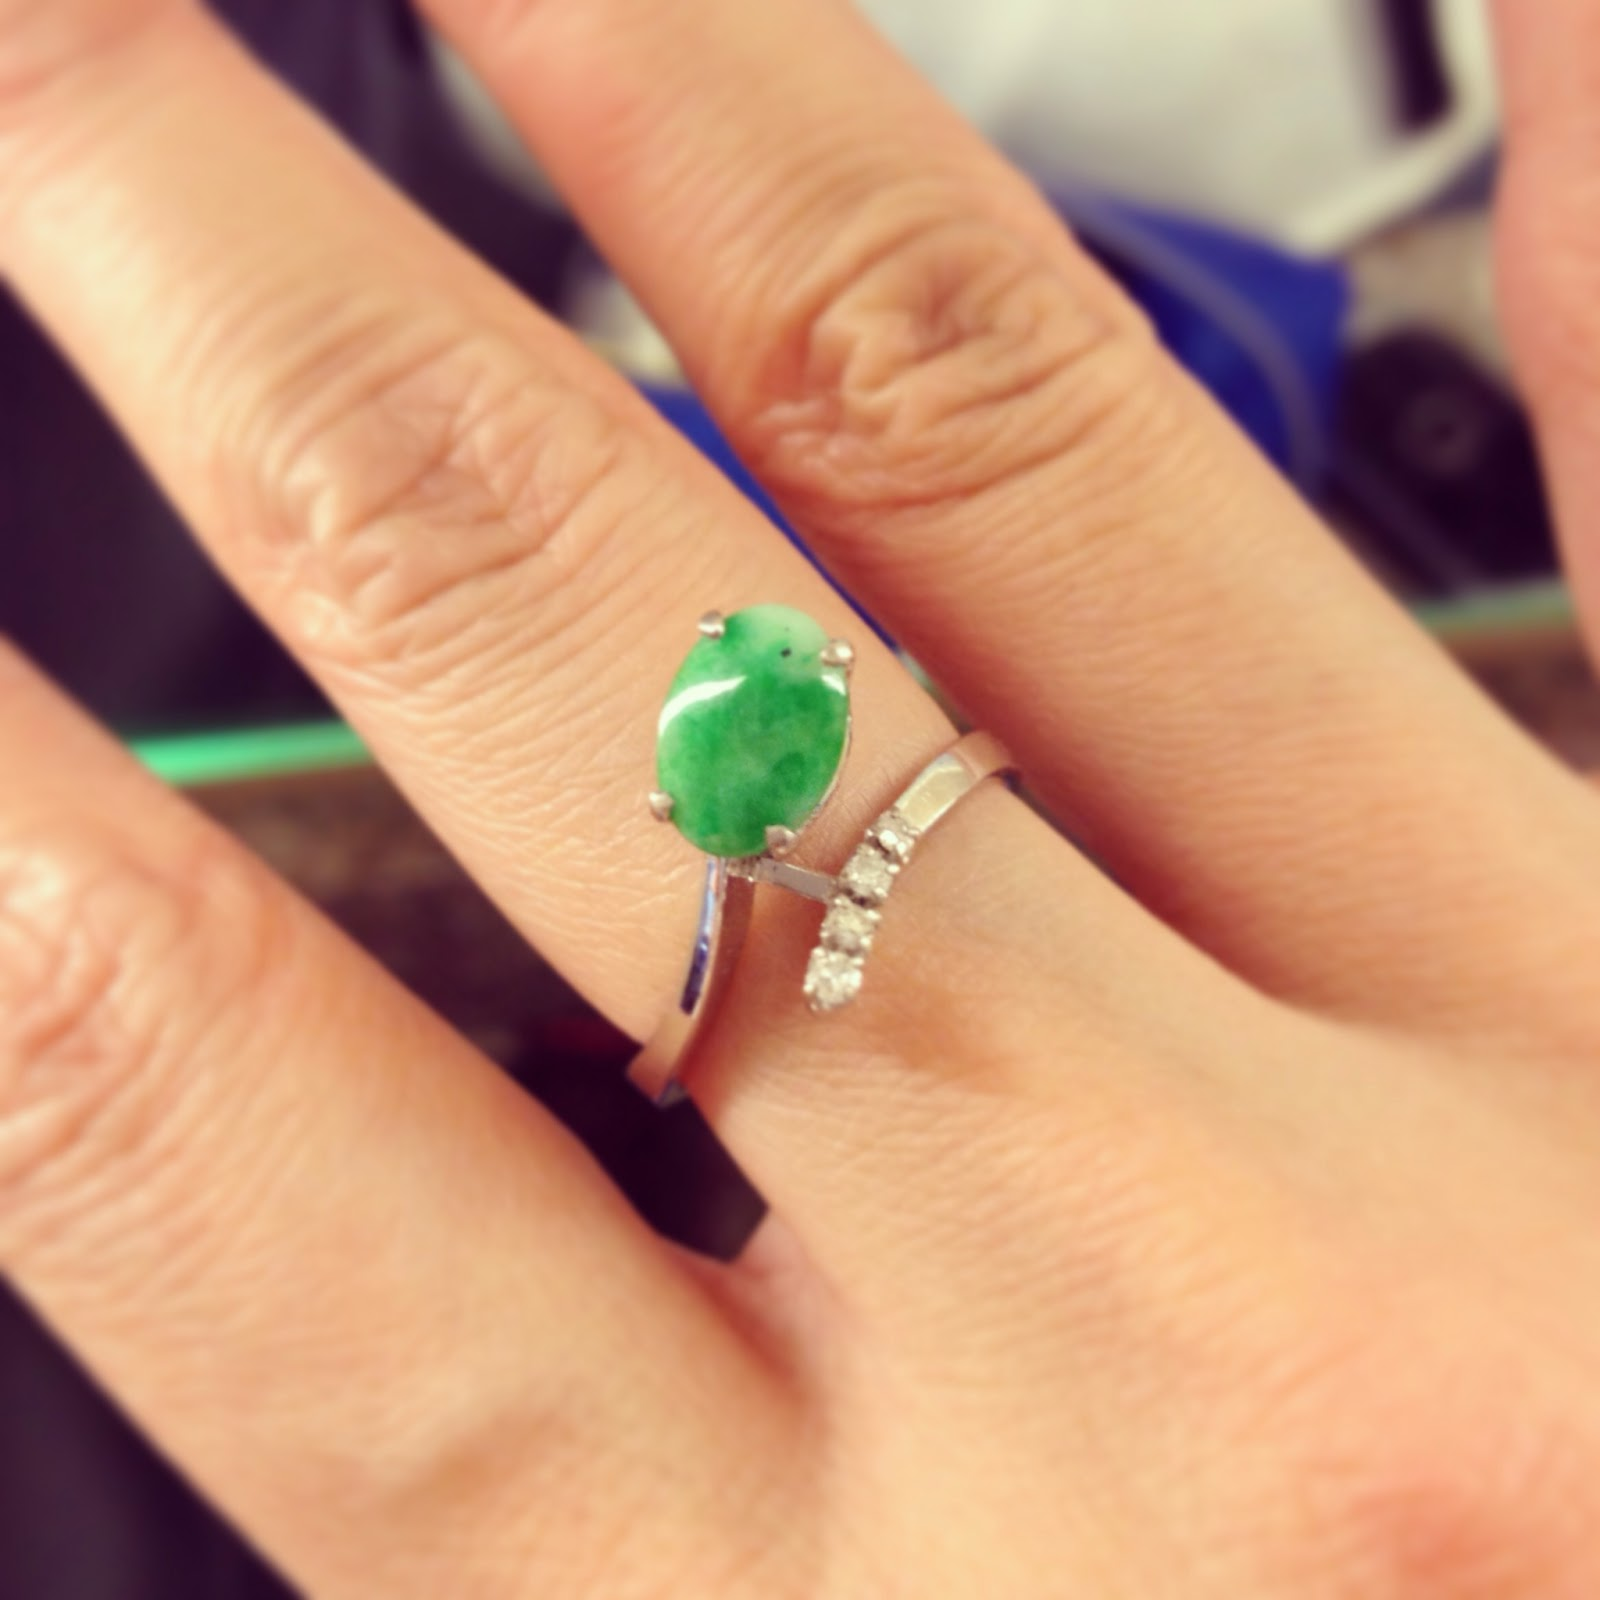 a keepsake wedding gift my aunts jade keepsake wedding rings A Keepsake Wedding Gift My Aunt s Jade Ring